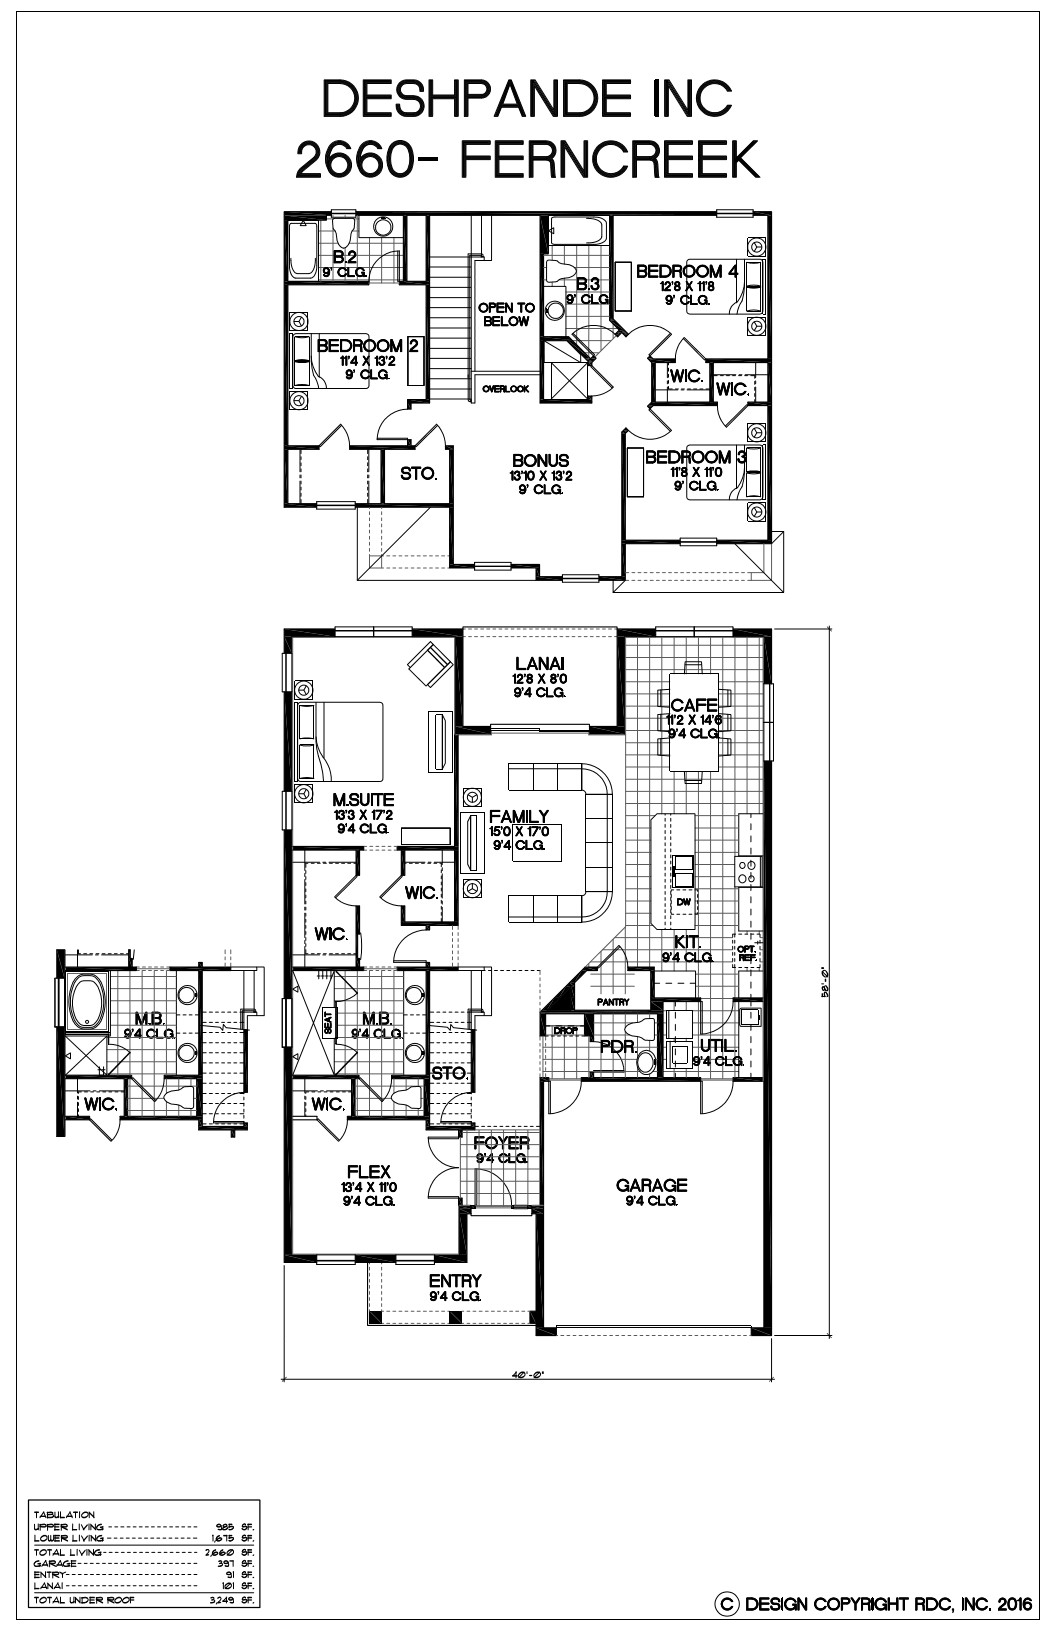 Ferncreek-2660-Floor Plan